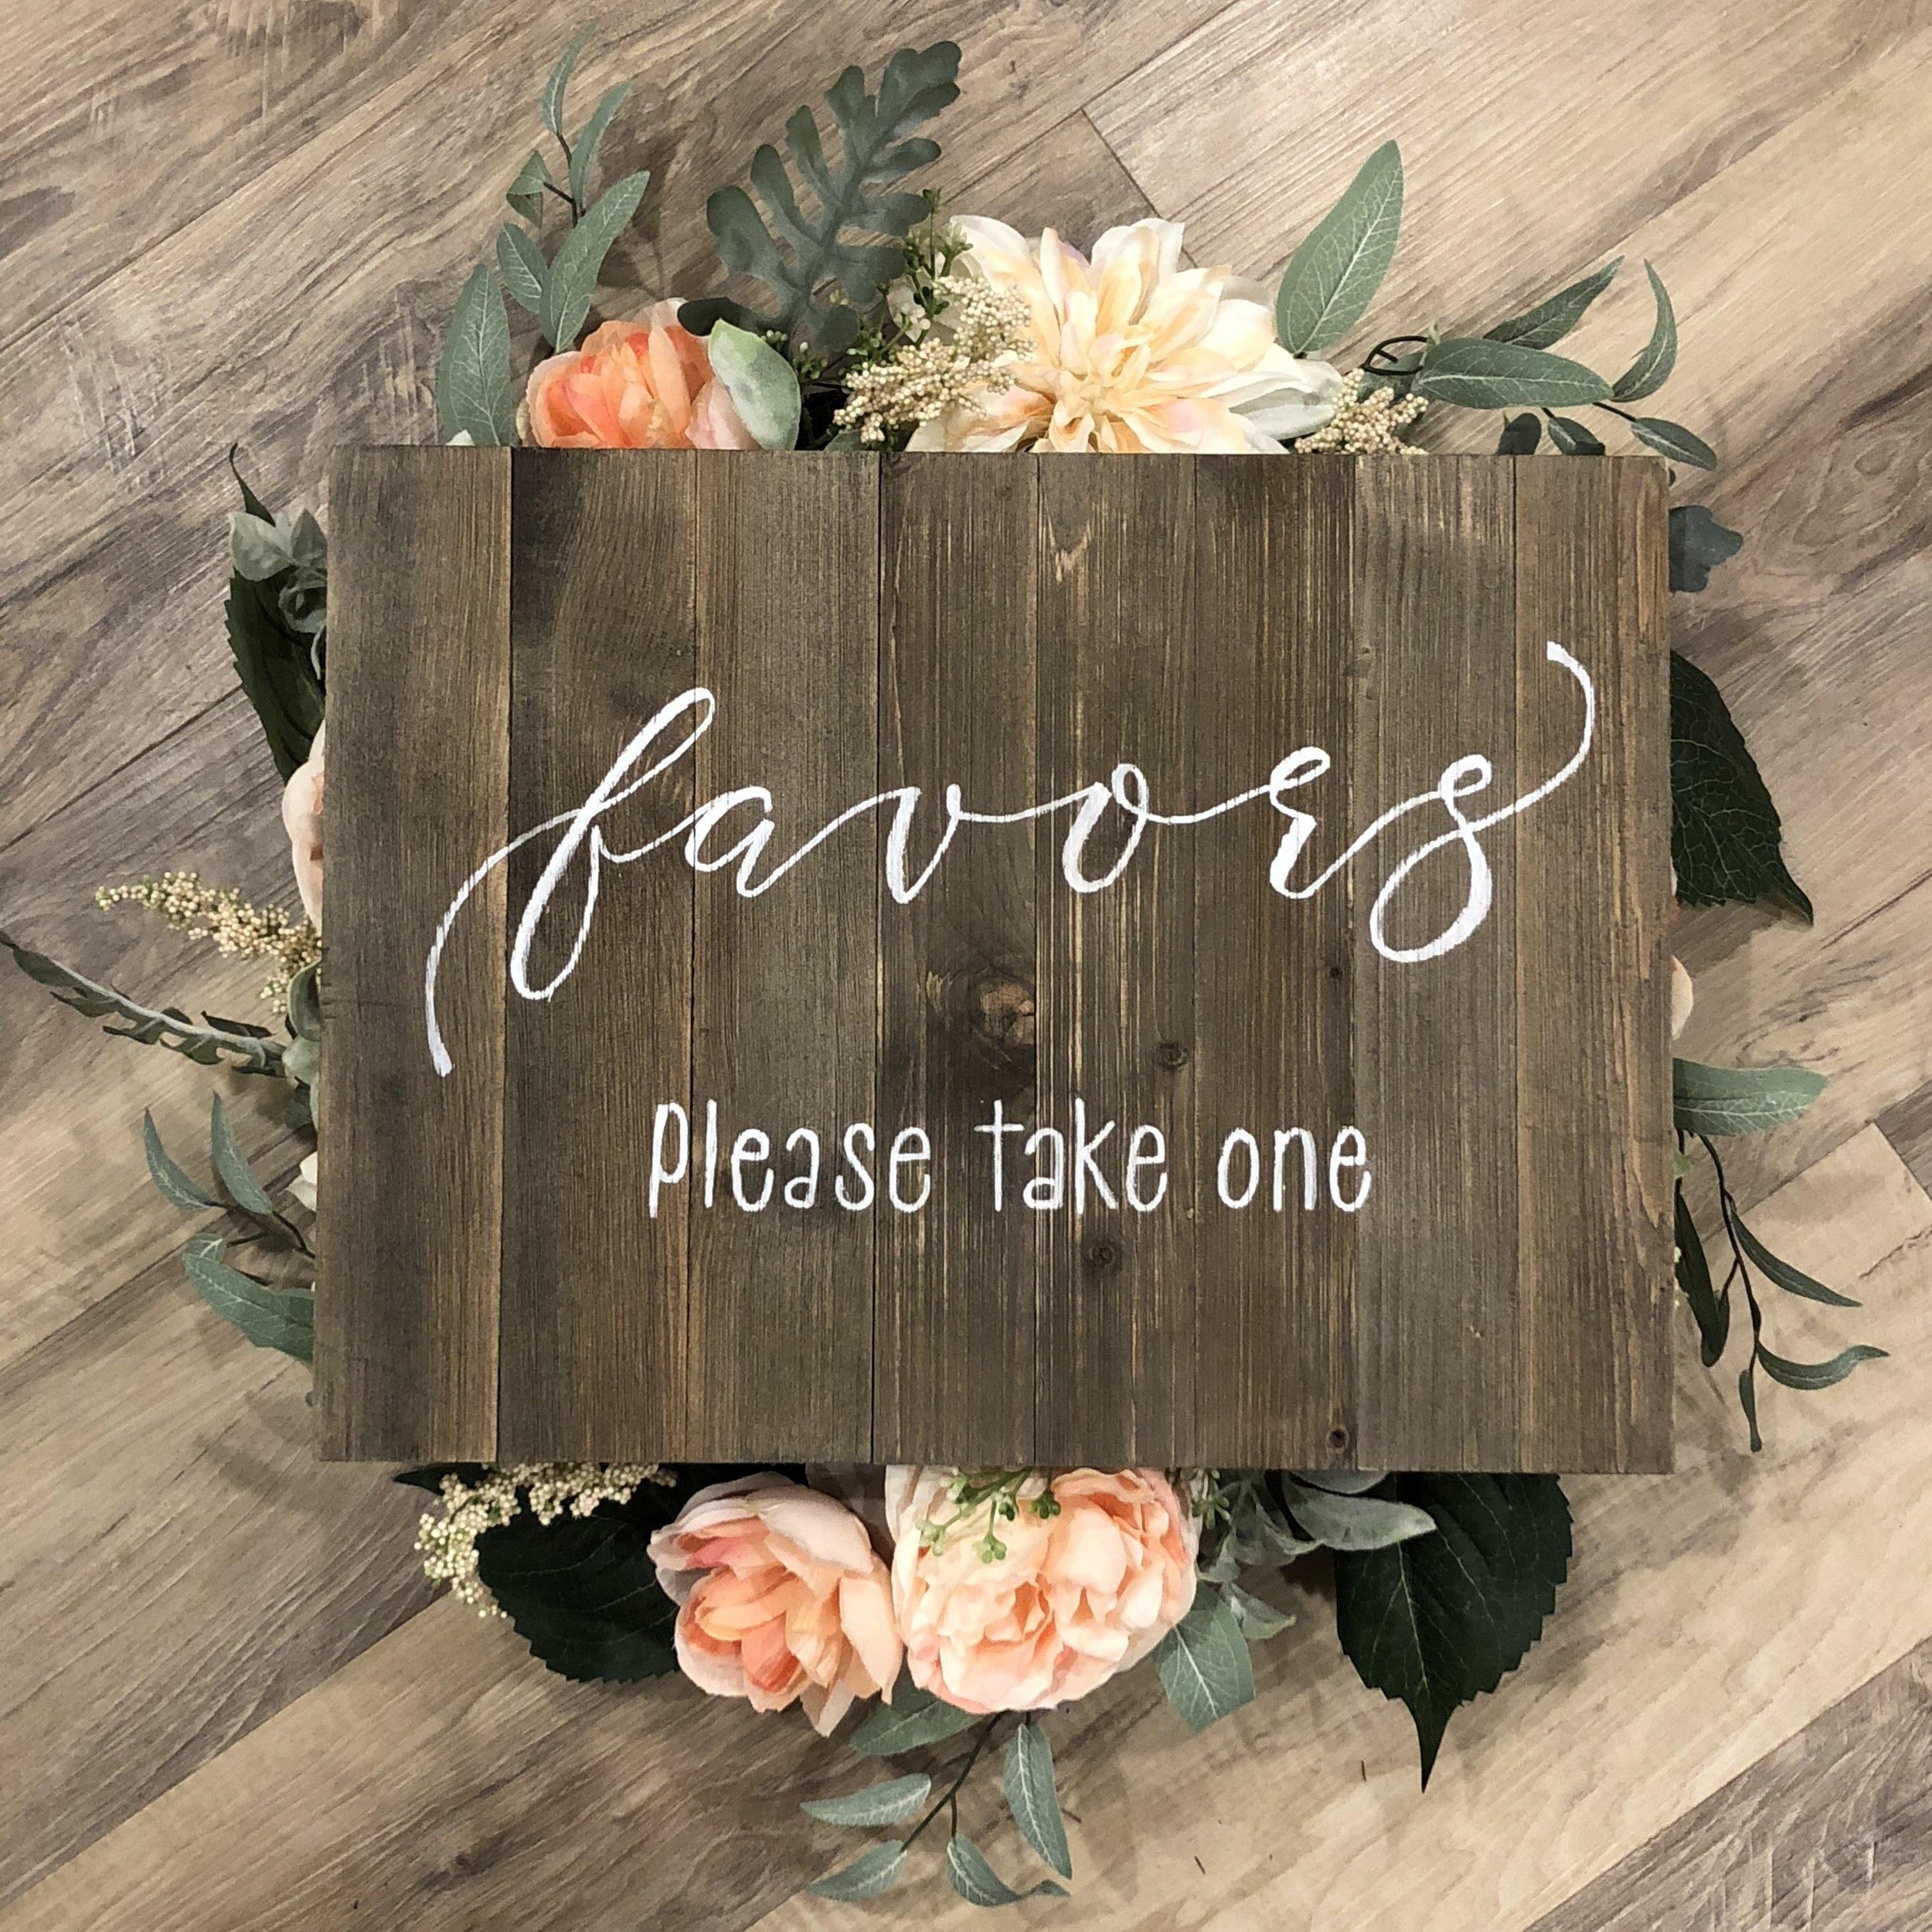 Central PA, York PA, JesSmith Designs, custom, wedding, invitations, bridal, Harrisburg, hanover, calligraphy, baltimore, wedding invitations, lancaster, gettysburg, 08-12 17.33.16.jpg